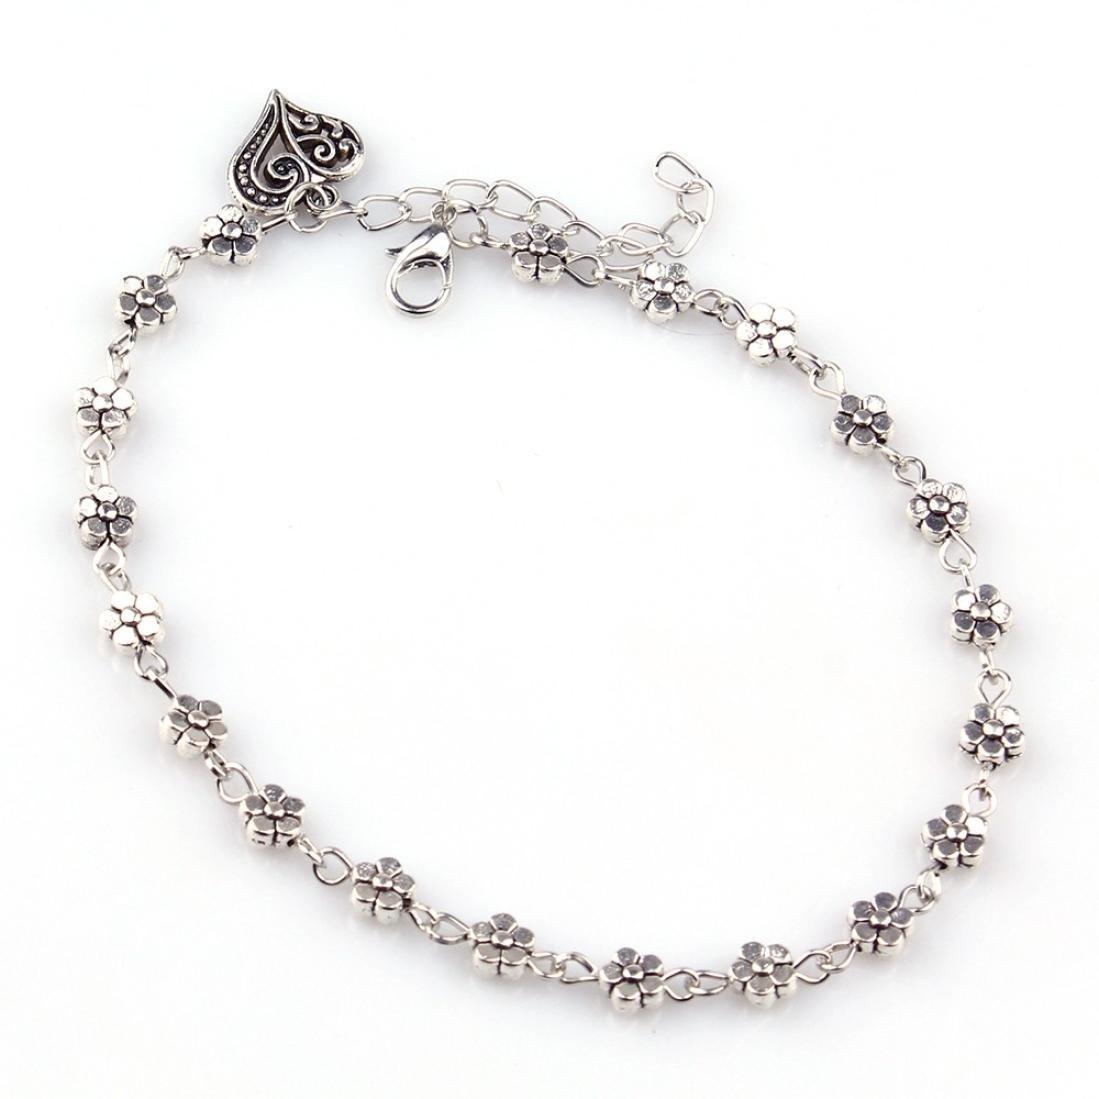 Anklets, Leyorie Women Silver Bead Flower Chain Ankle Bracelet Barefoot Heart Pendant Sandal Beach Foot